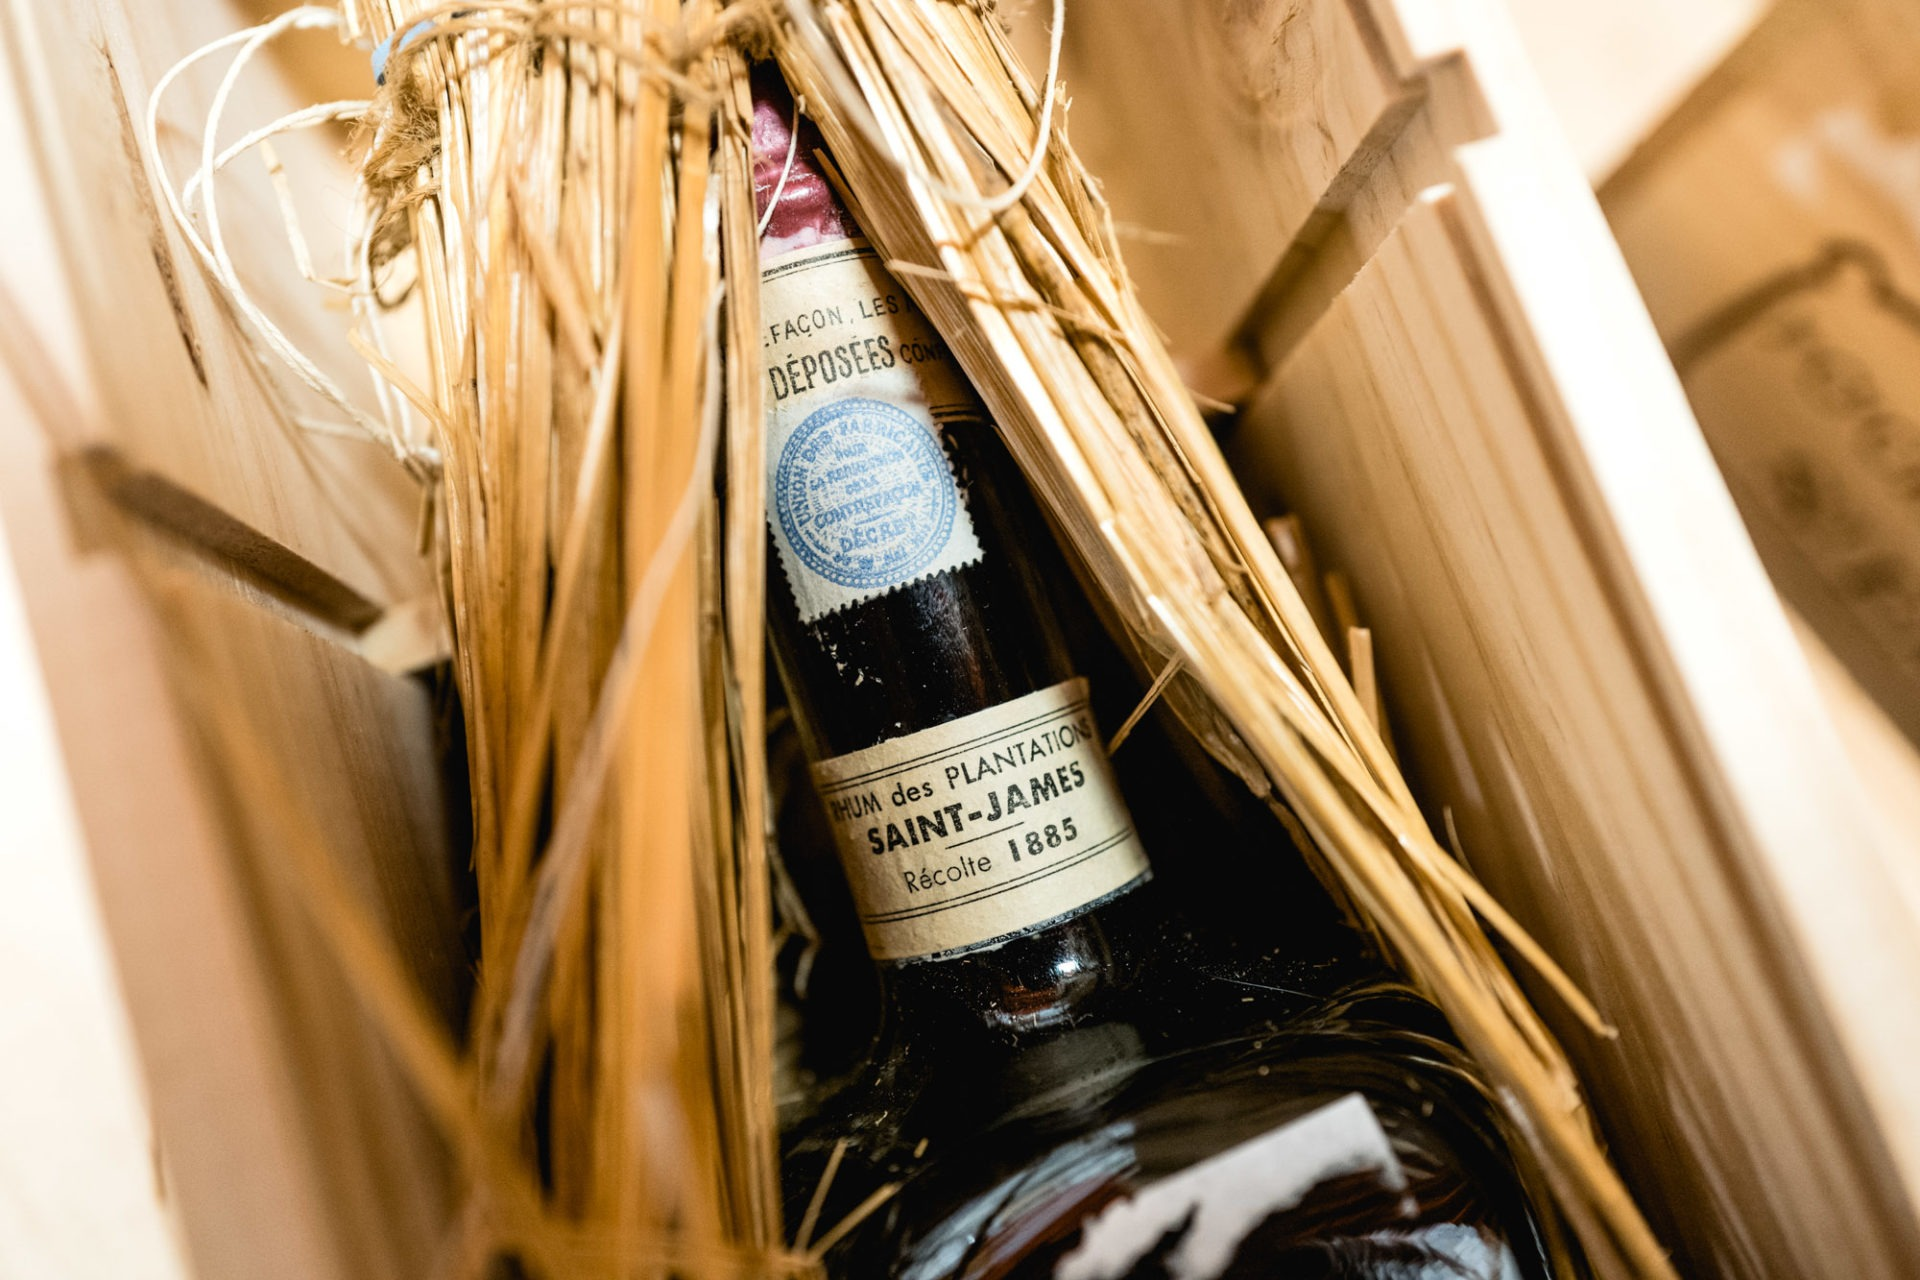 Tajan - Vente de vins et spiritueux du jeudi 25 avril 2019 - Rhum Saint-James 1885